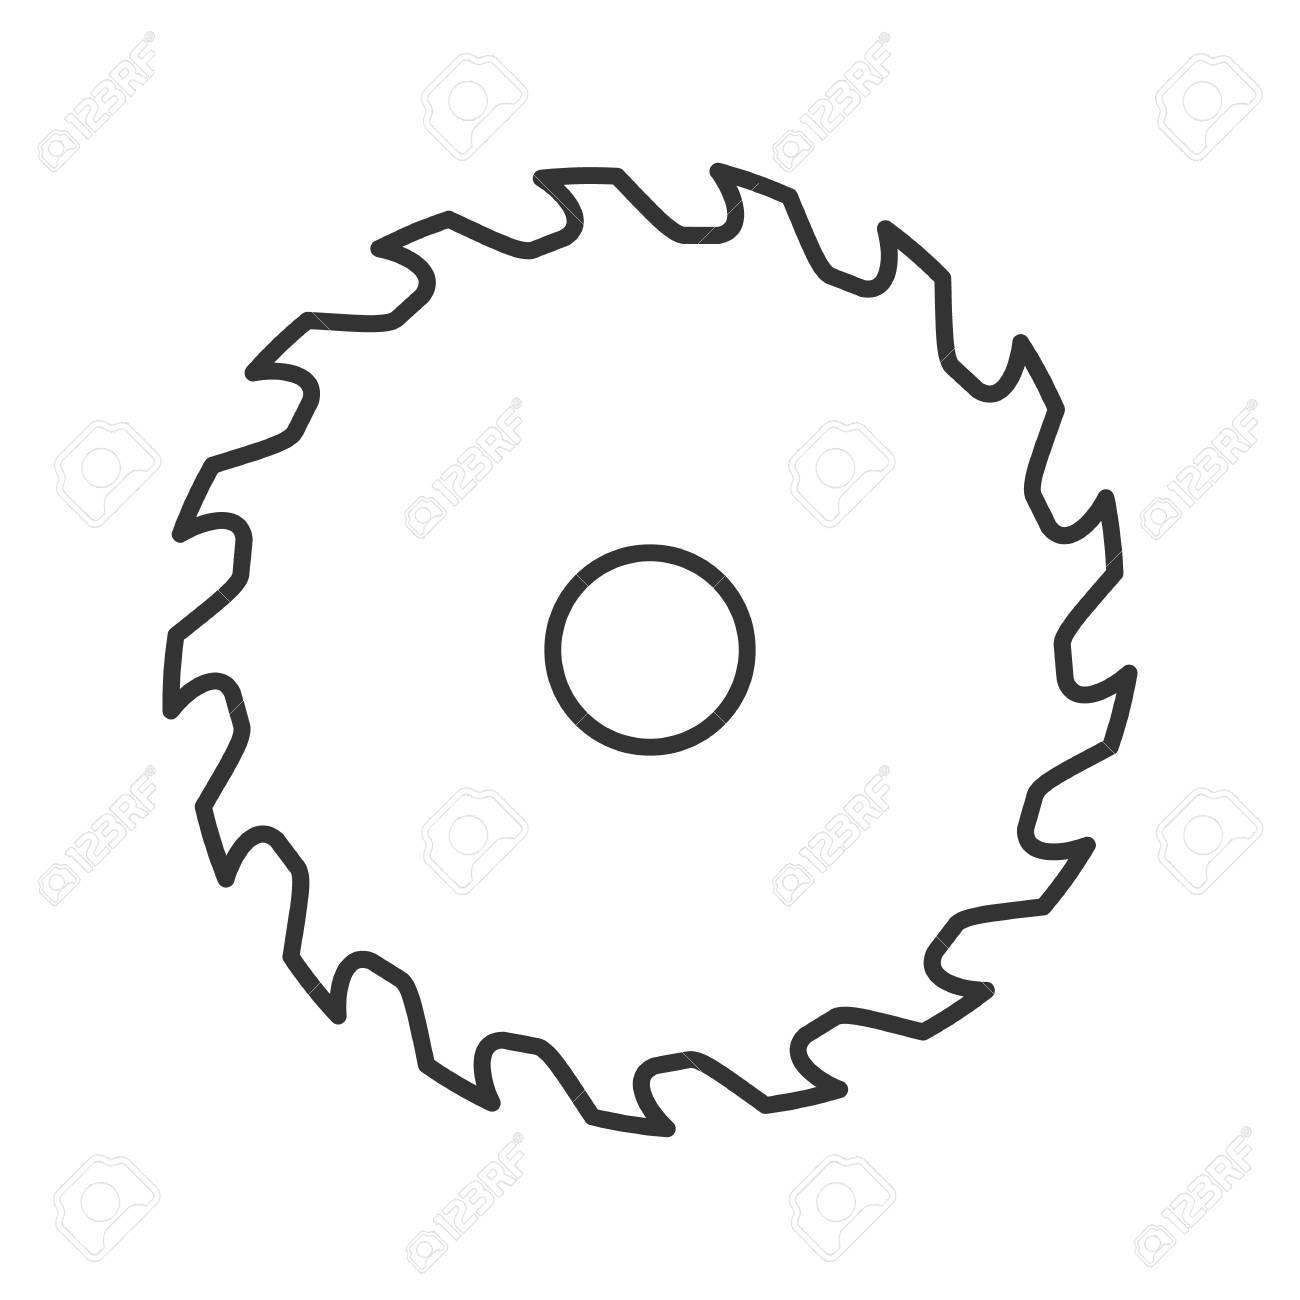 circular saw blade drawing at getdrawings com free for personal rh getdrawings com saw blade outline clip art saw blade clip art black and white flat